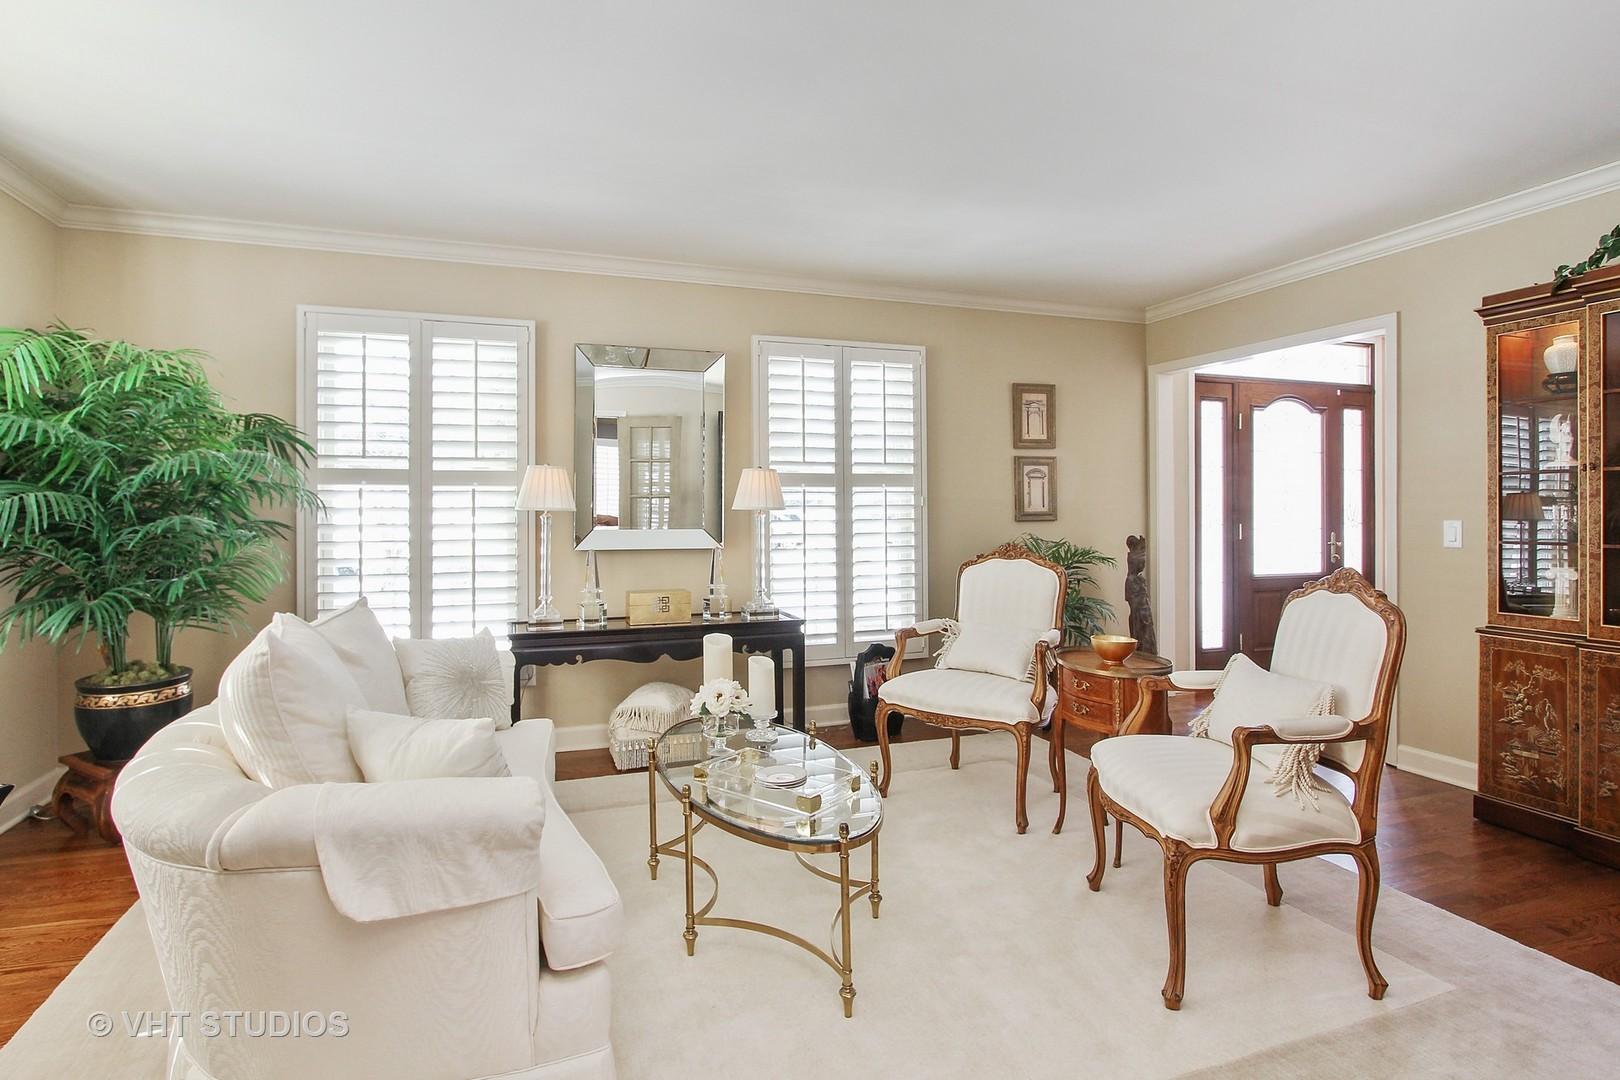 28 Saint John Drive, Hawthorn Woods, IL, 60047 | Prime Real Estate ...